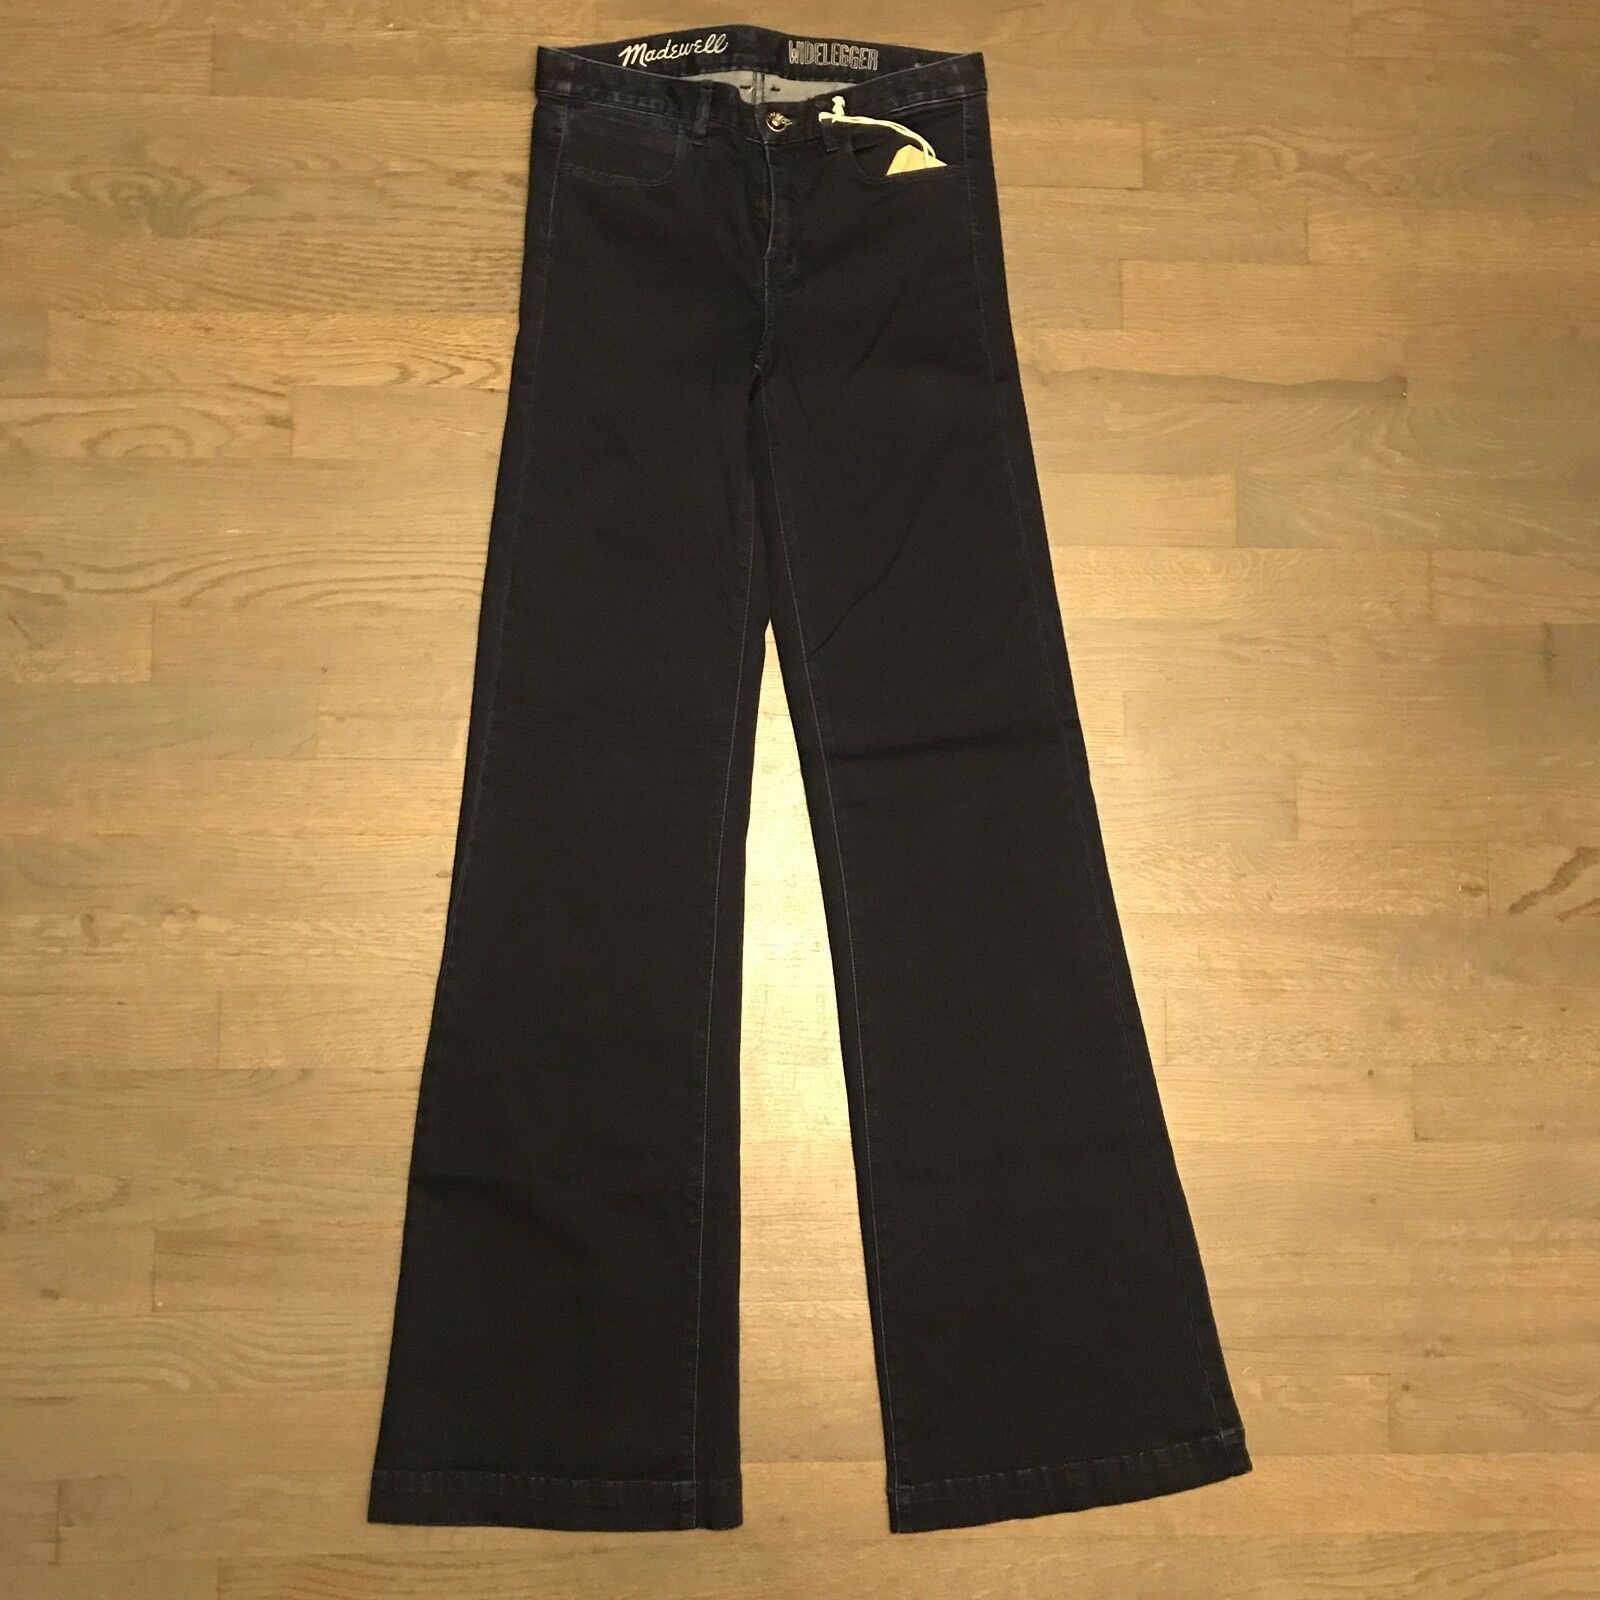 Madewell Widelegger Jeans Dark bluee Wash Size 26x34  NWT Flare Dark 49977